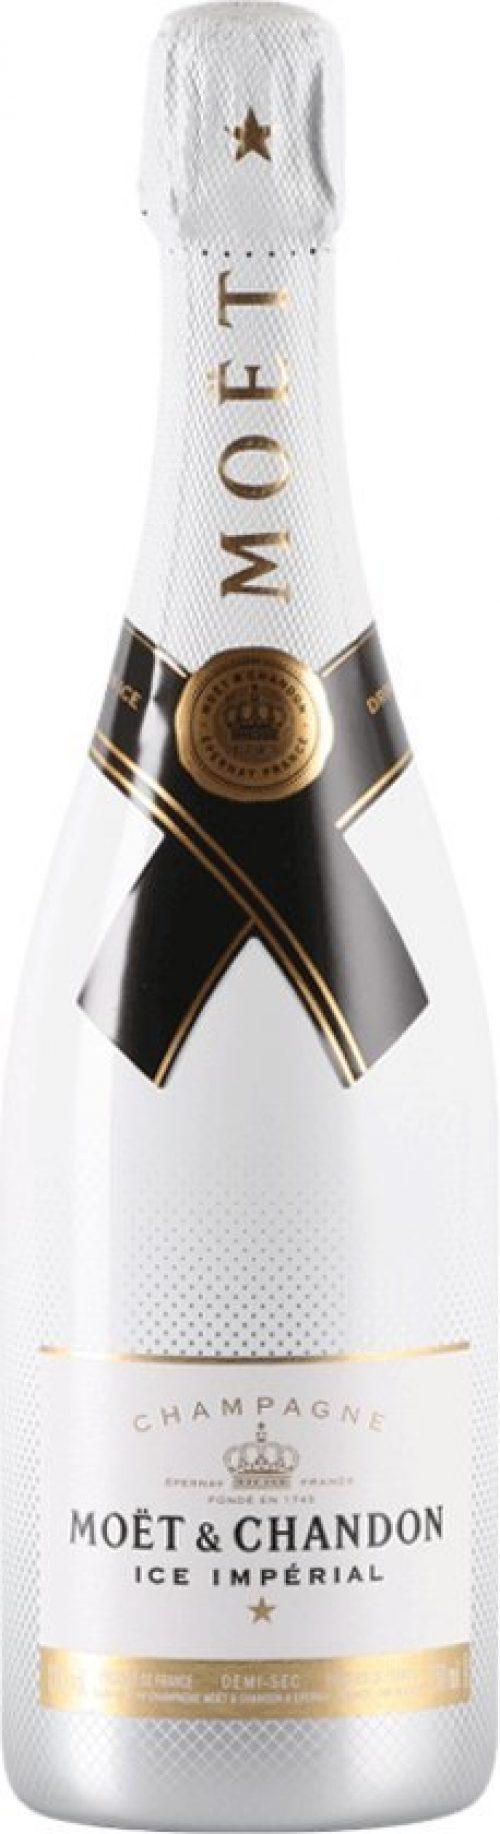 Moët & Chandon Ice Impérial - Champagne - Magnum - Witte wijn - Chardonnay|Pinot Meunier|Pinot Noir - 150 cl